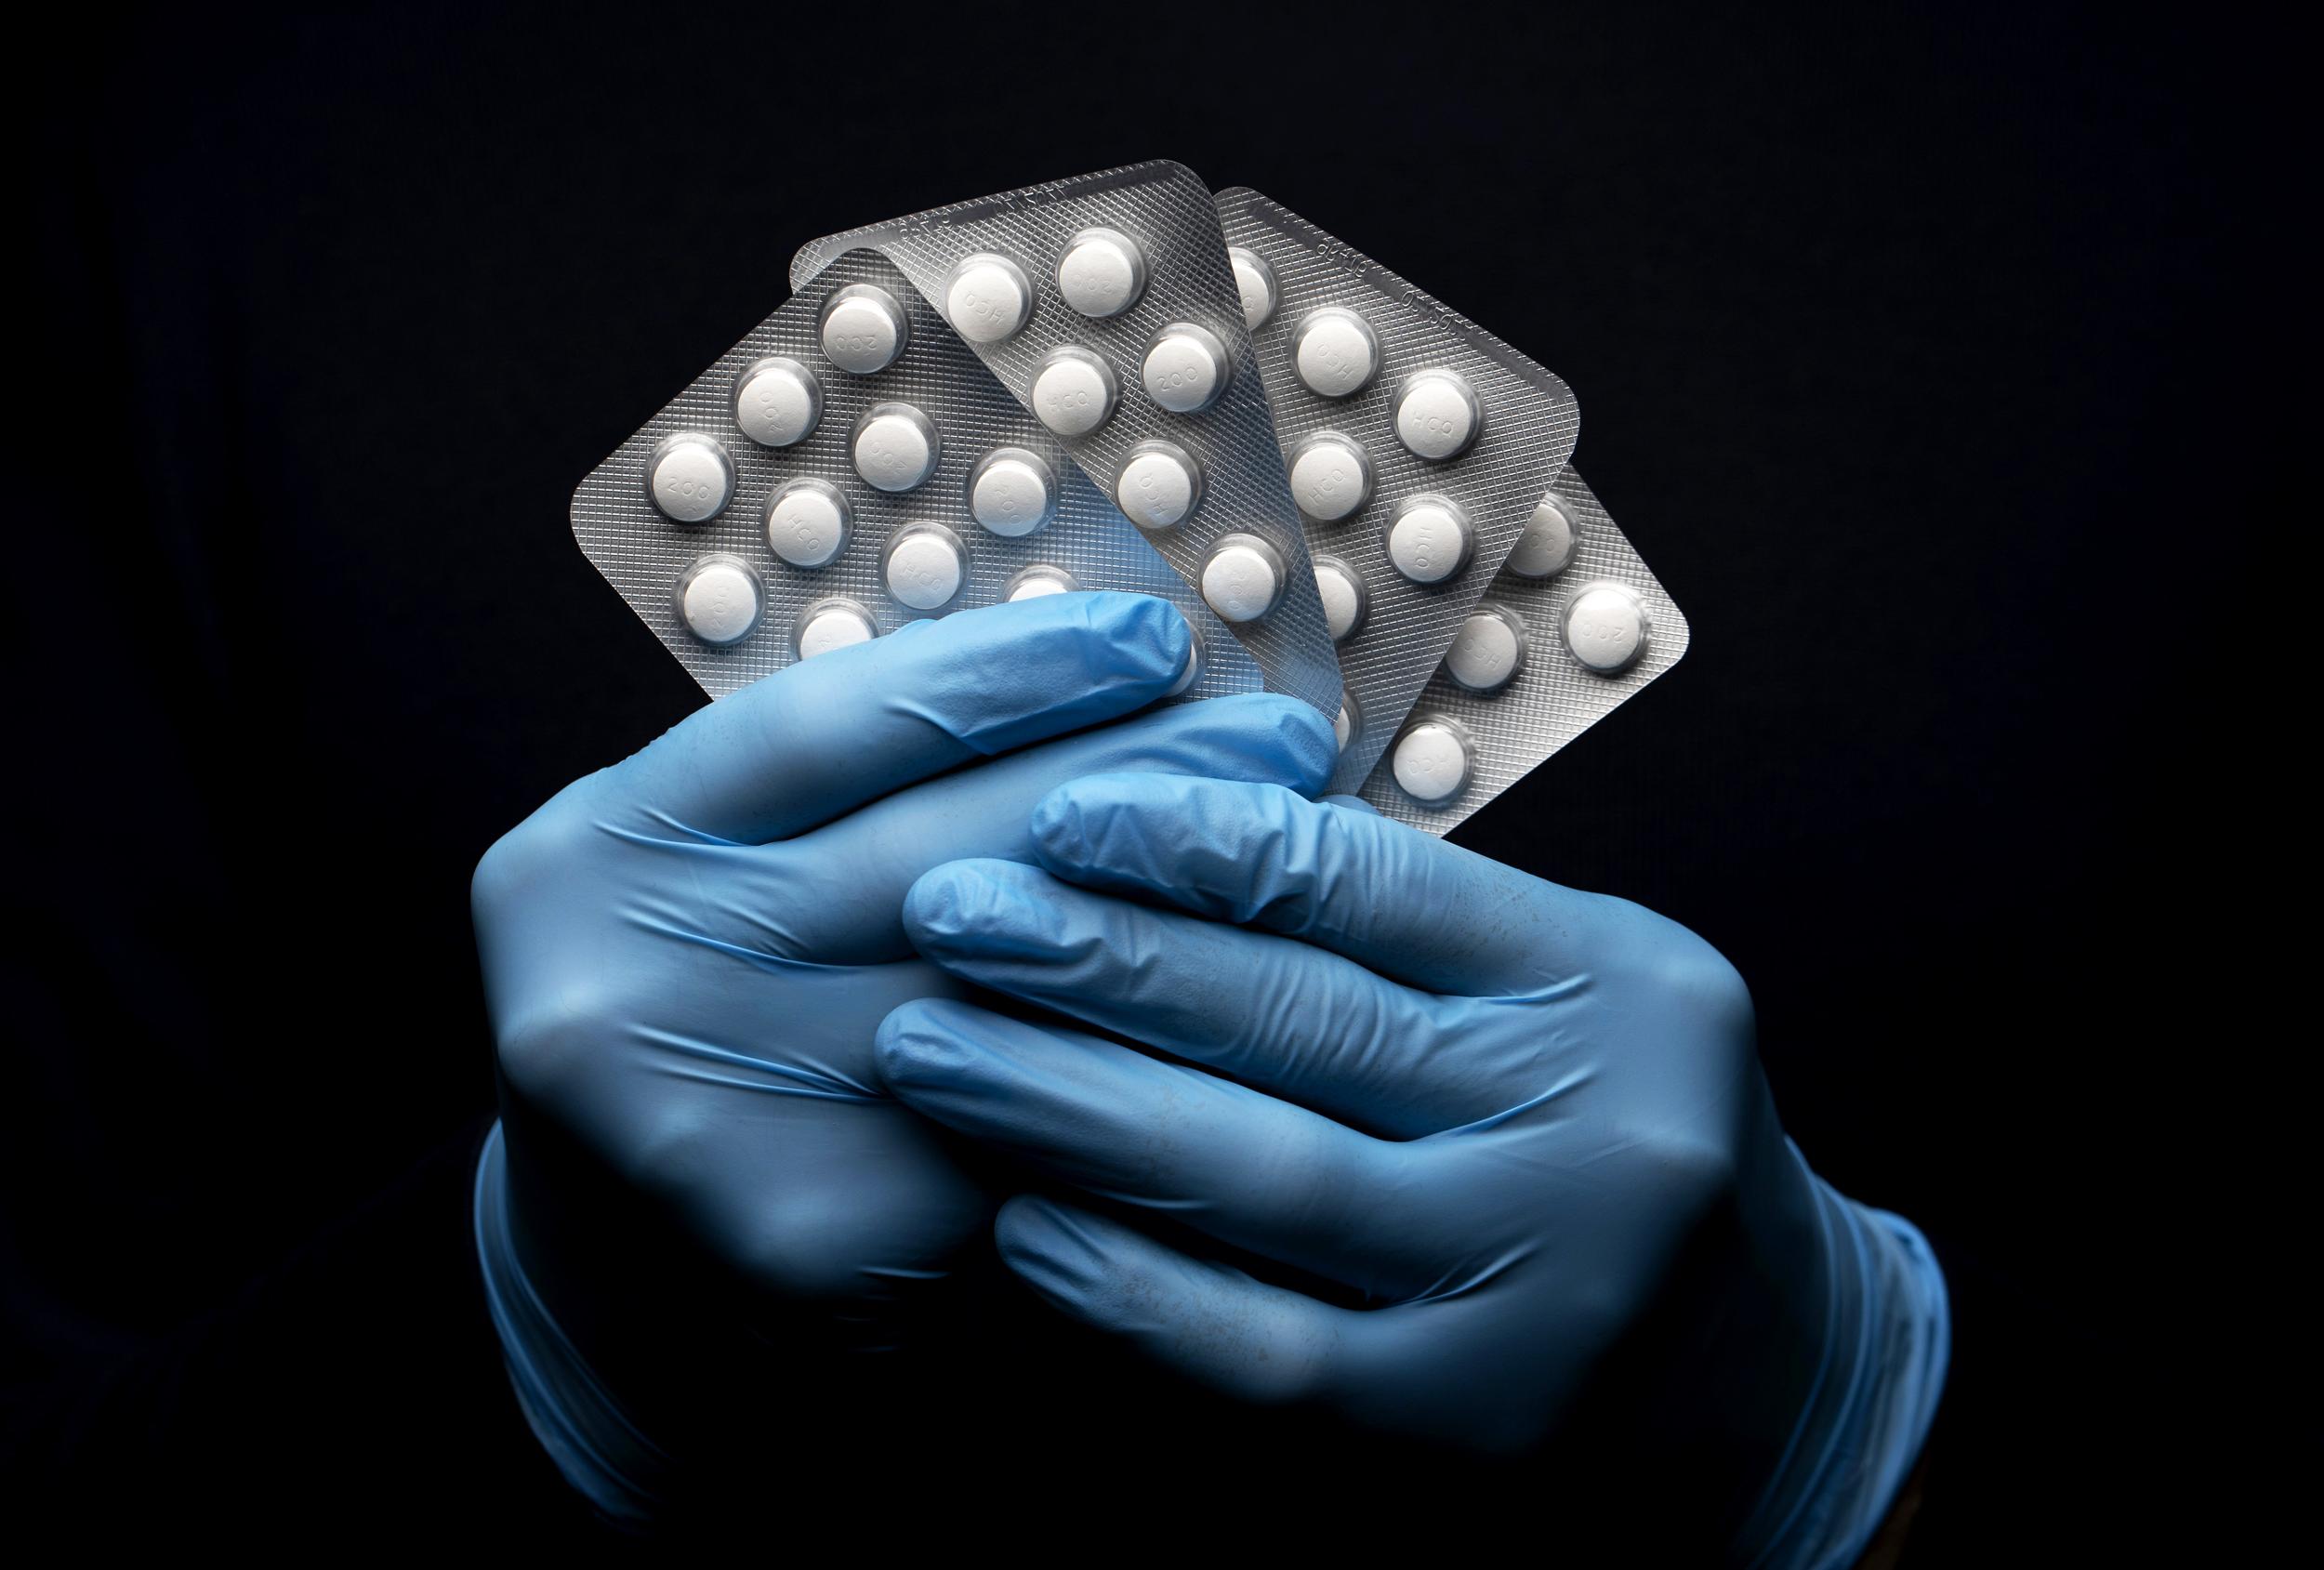 World Health Organization halts hydroxychloroquine study